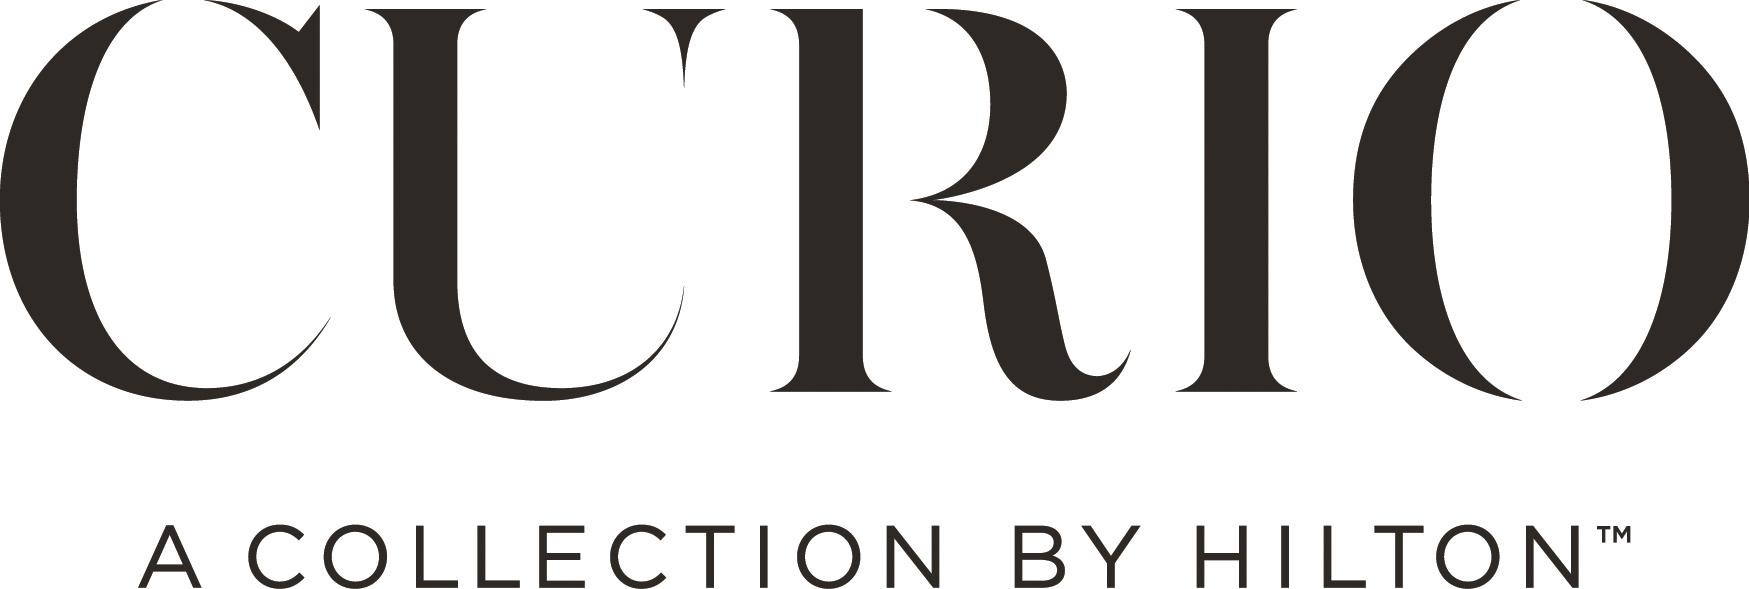 Curio - A Collection By Hilton